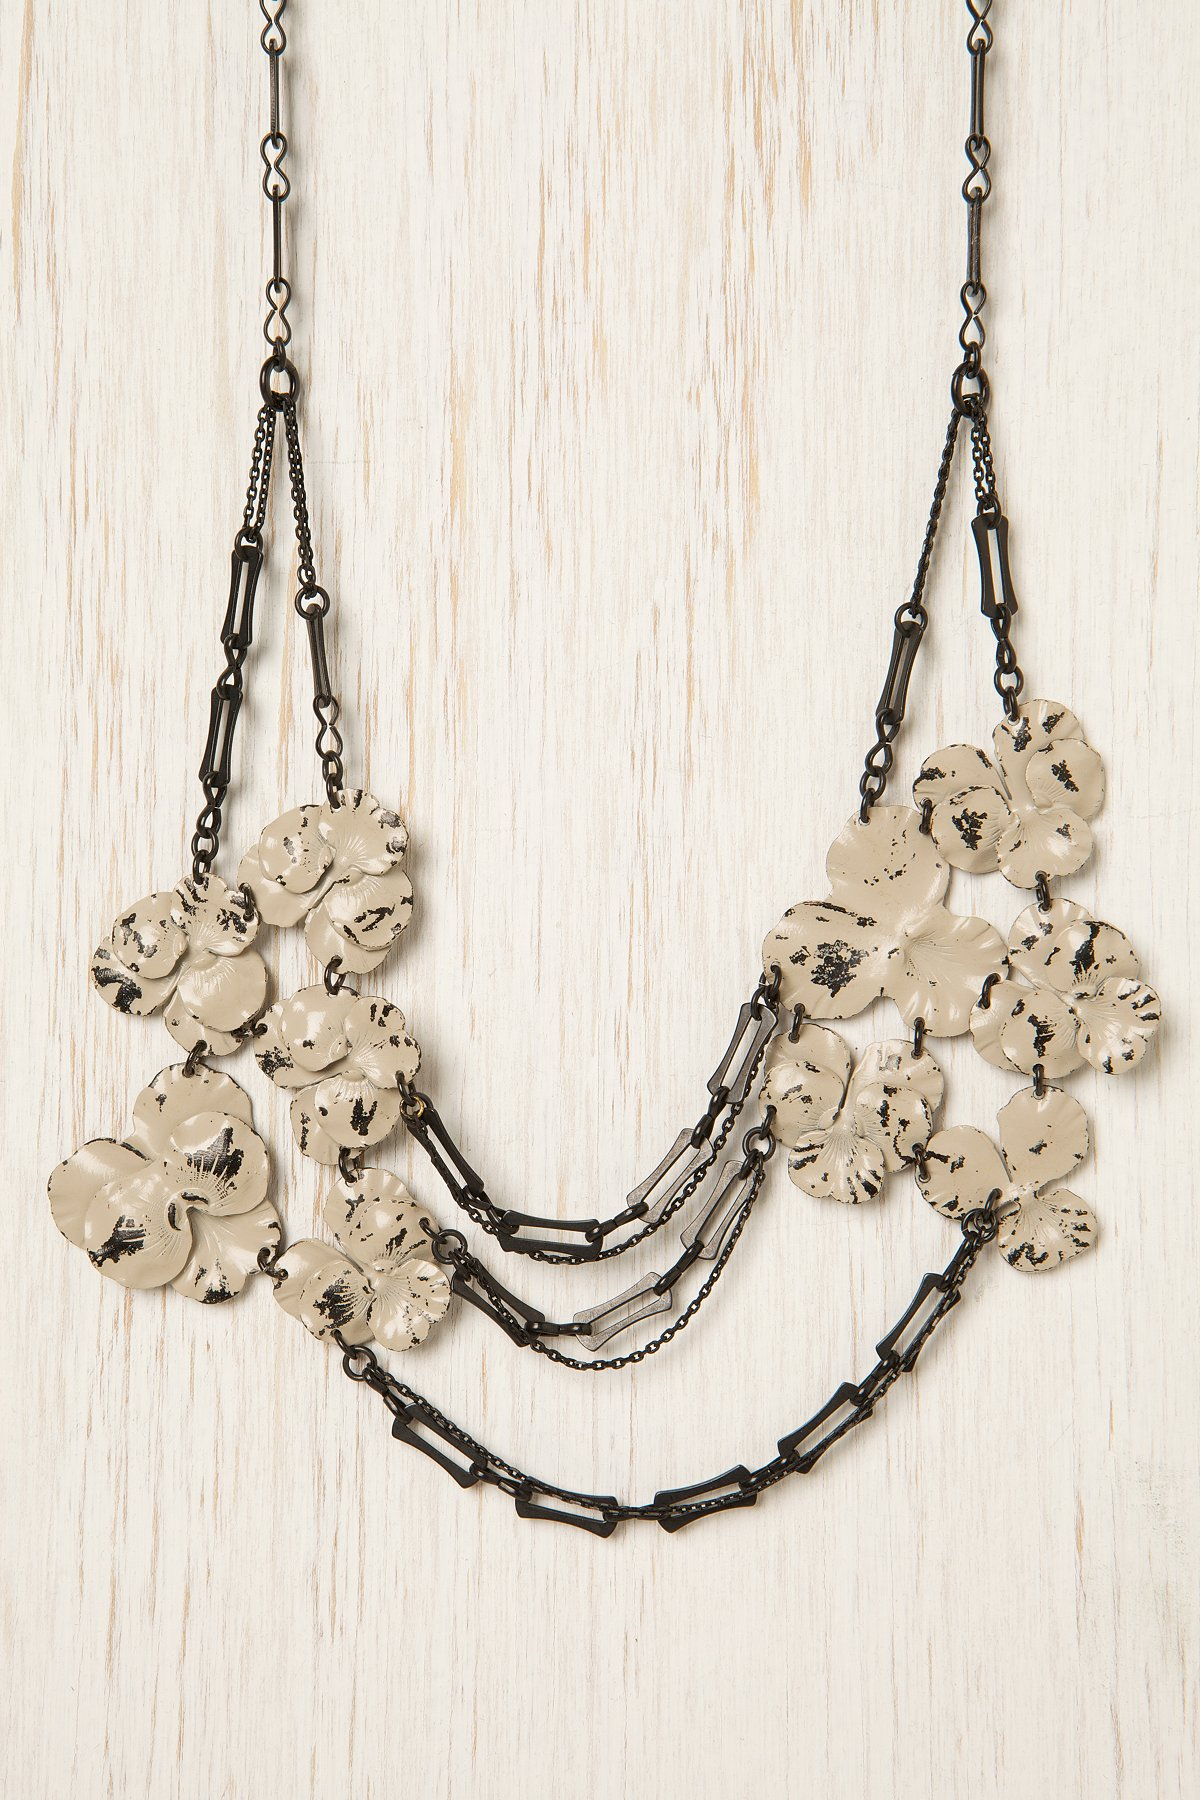 White Harvest Necklace